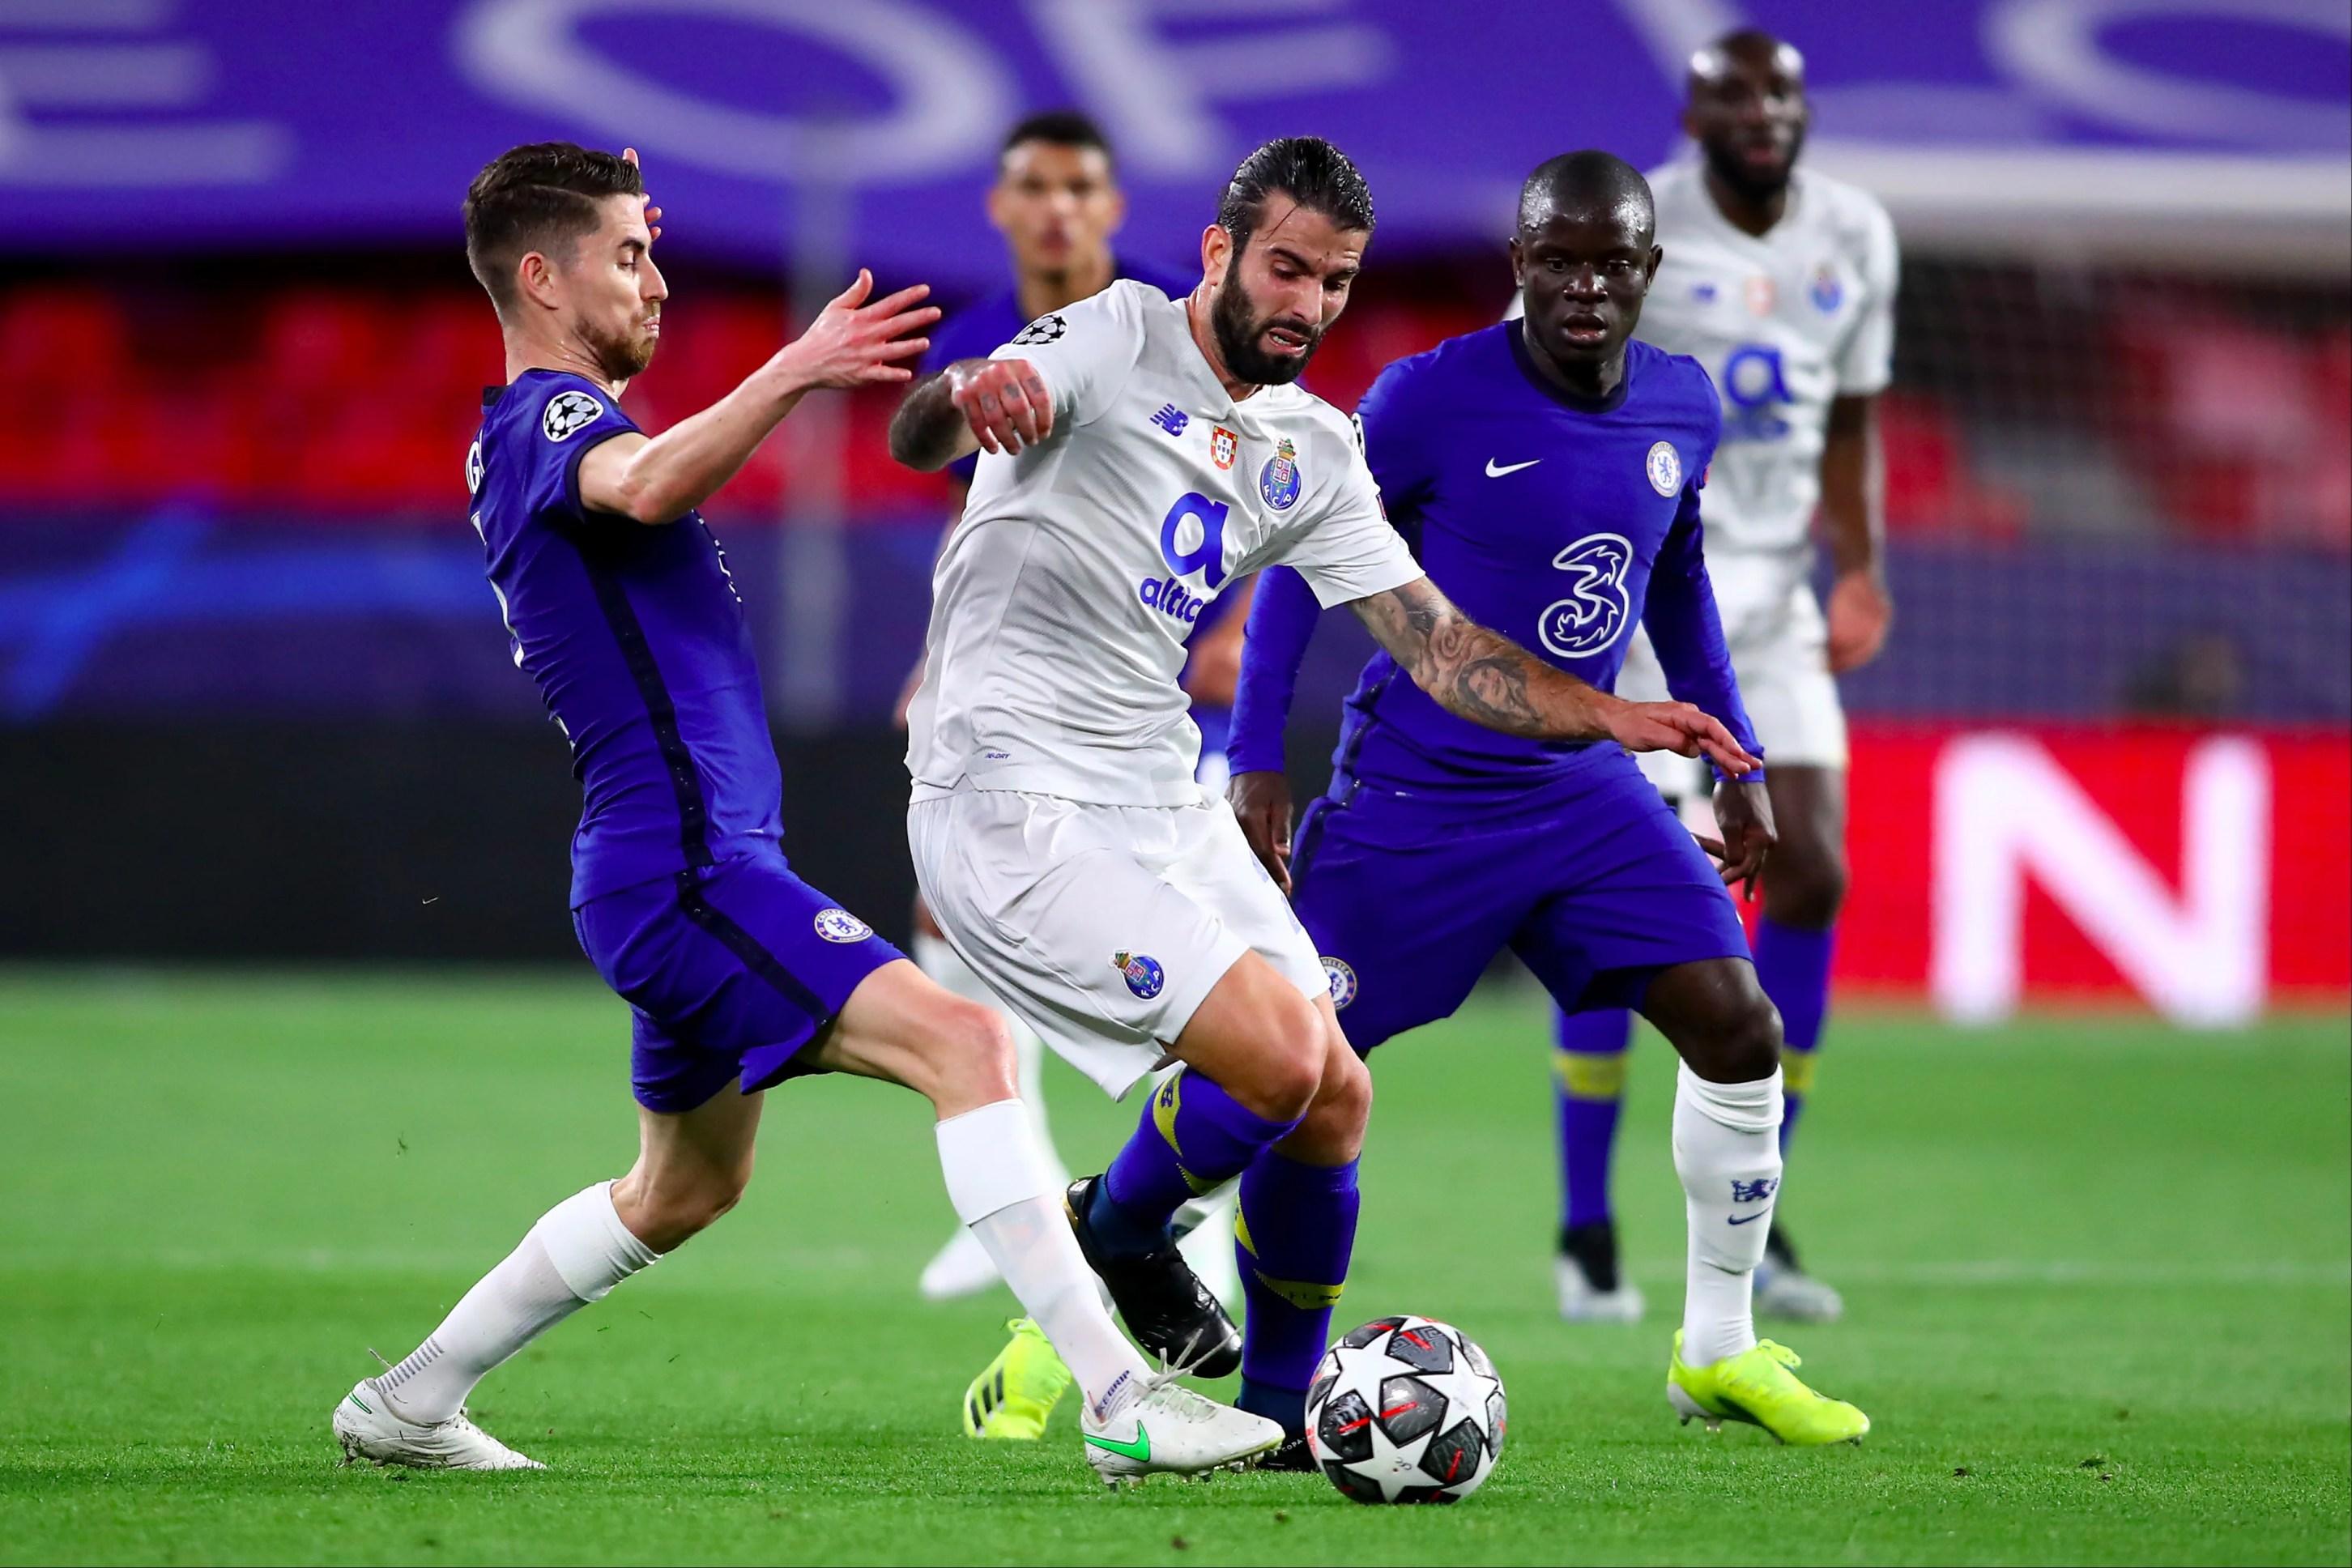 Chelsea FC player ratings vs Porto: N'Golo Kante and Jorginho impress on a quiet night for Mason Mount   Evening Standard